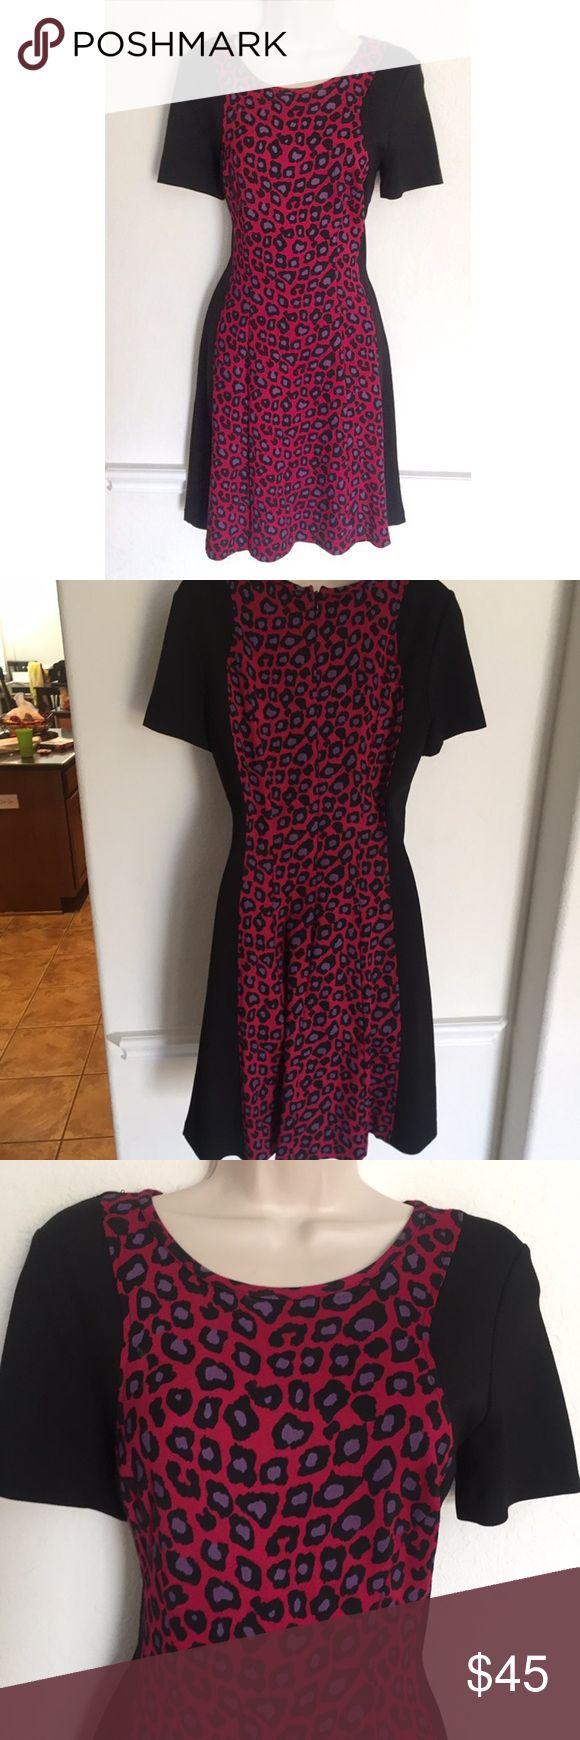 CATHERINE Catherine Malandrino Pink Leopard Dress CATHERINE Catherine Malandrino Pink Leopard Dress size 4 Catherine Malandrino Dresses Midi